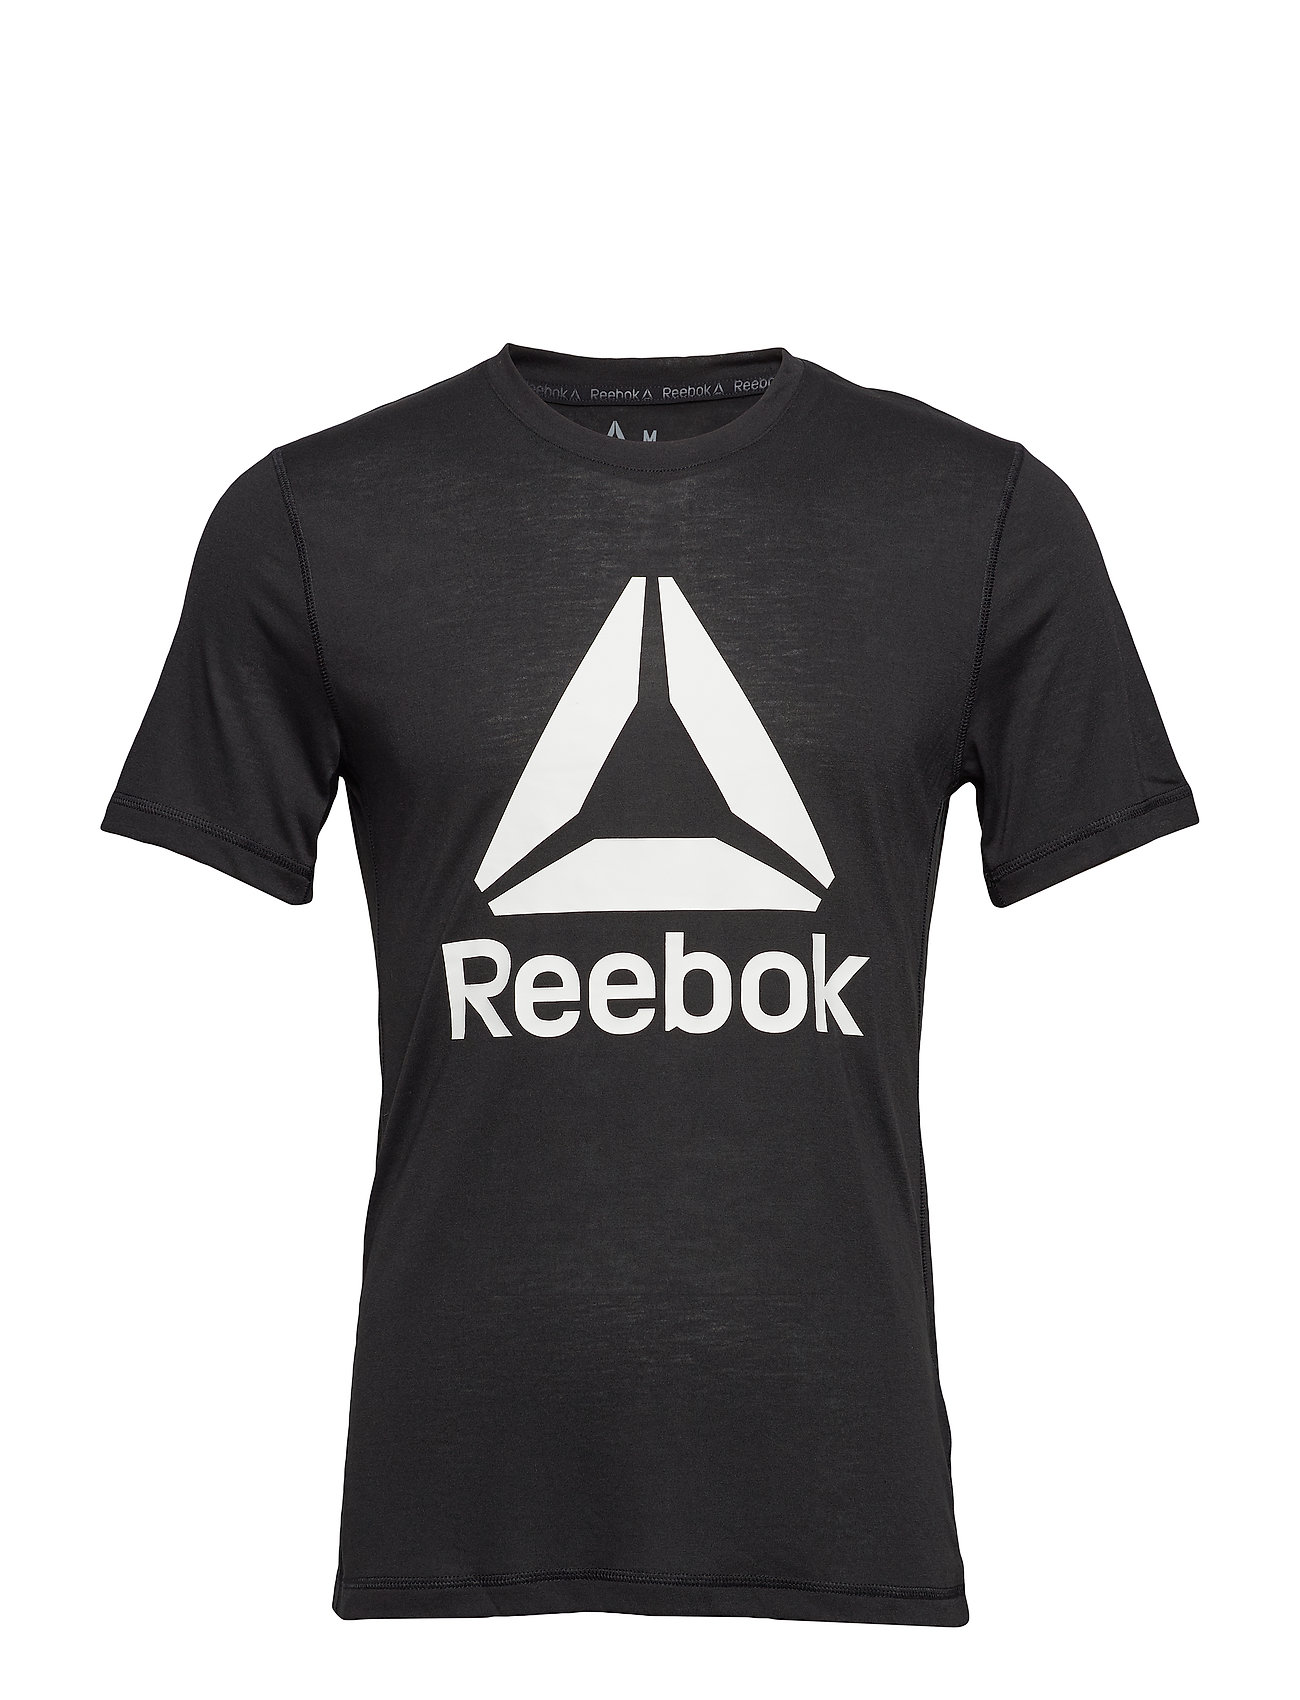 Reebok Performance WOR SUP 2.0 TEE GRAPH - BLACK